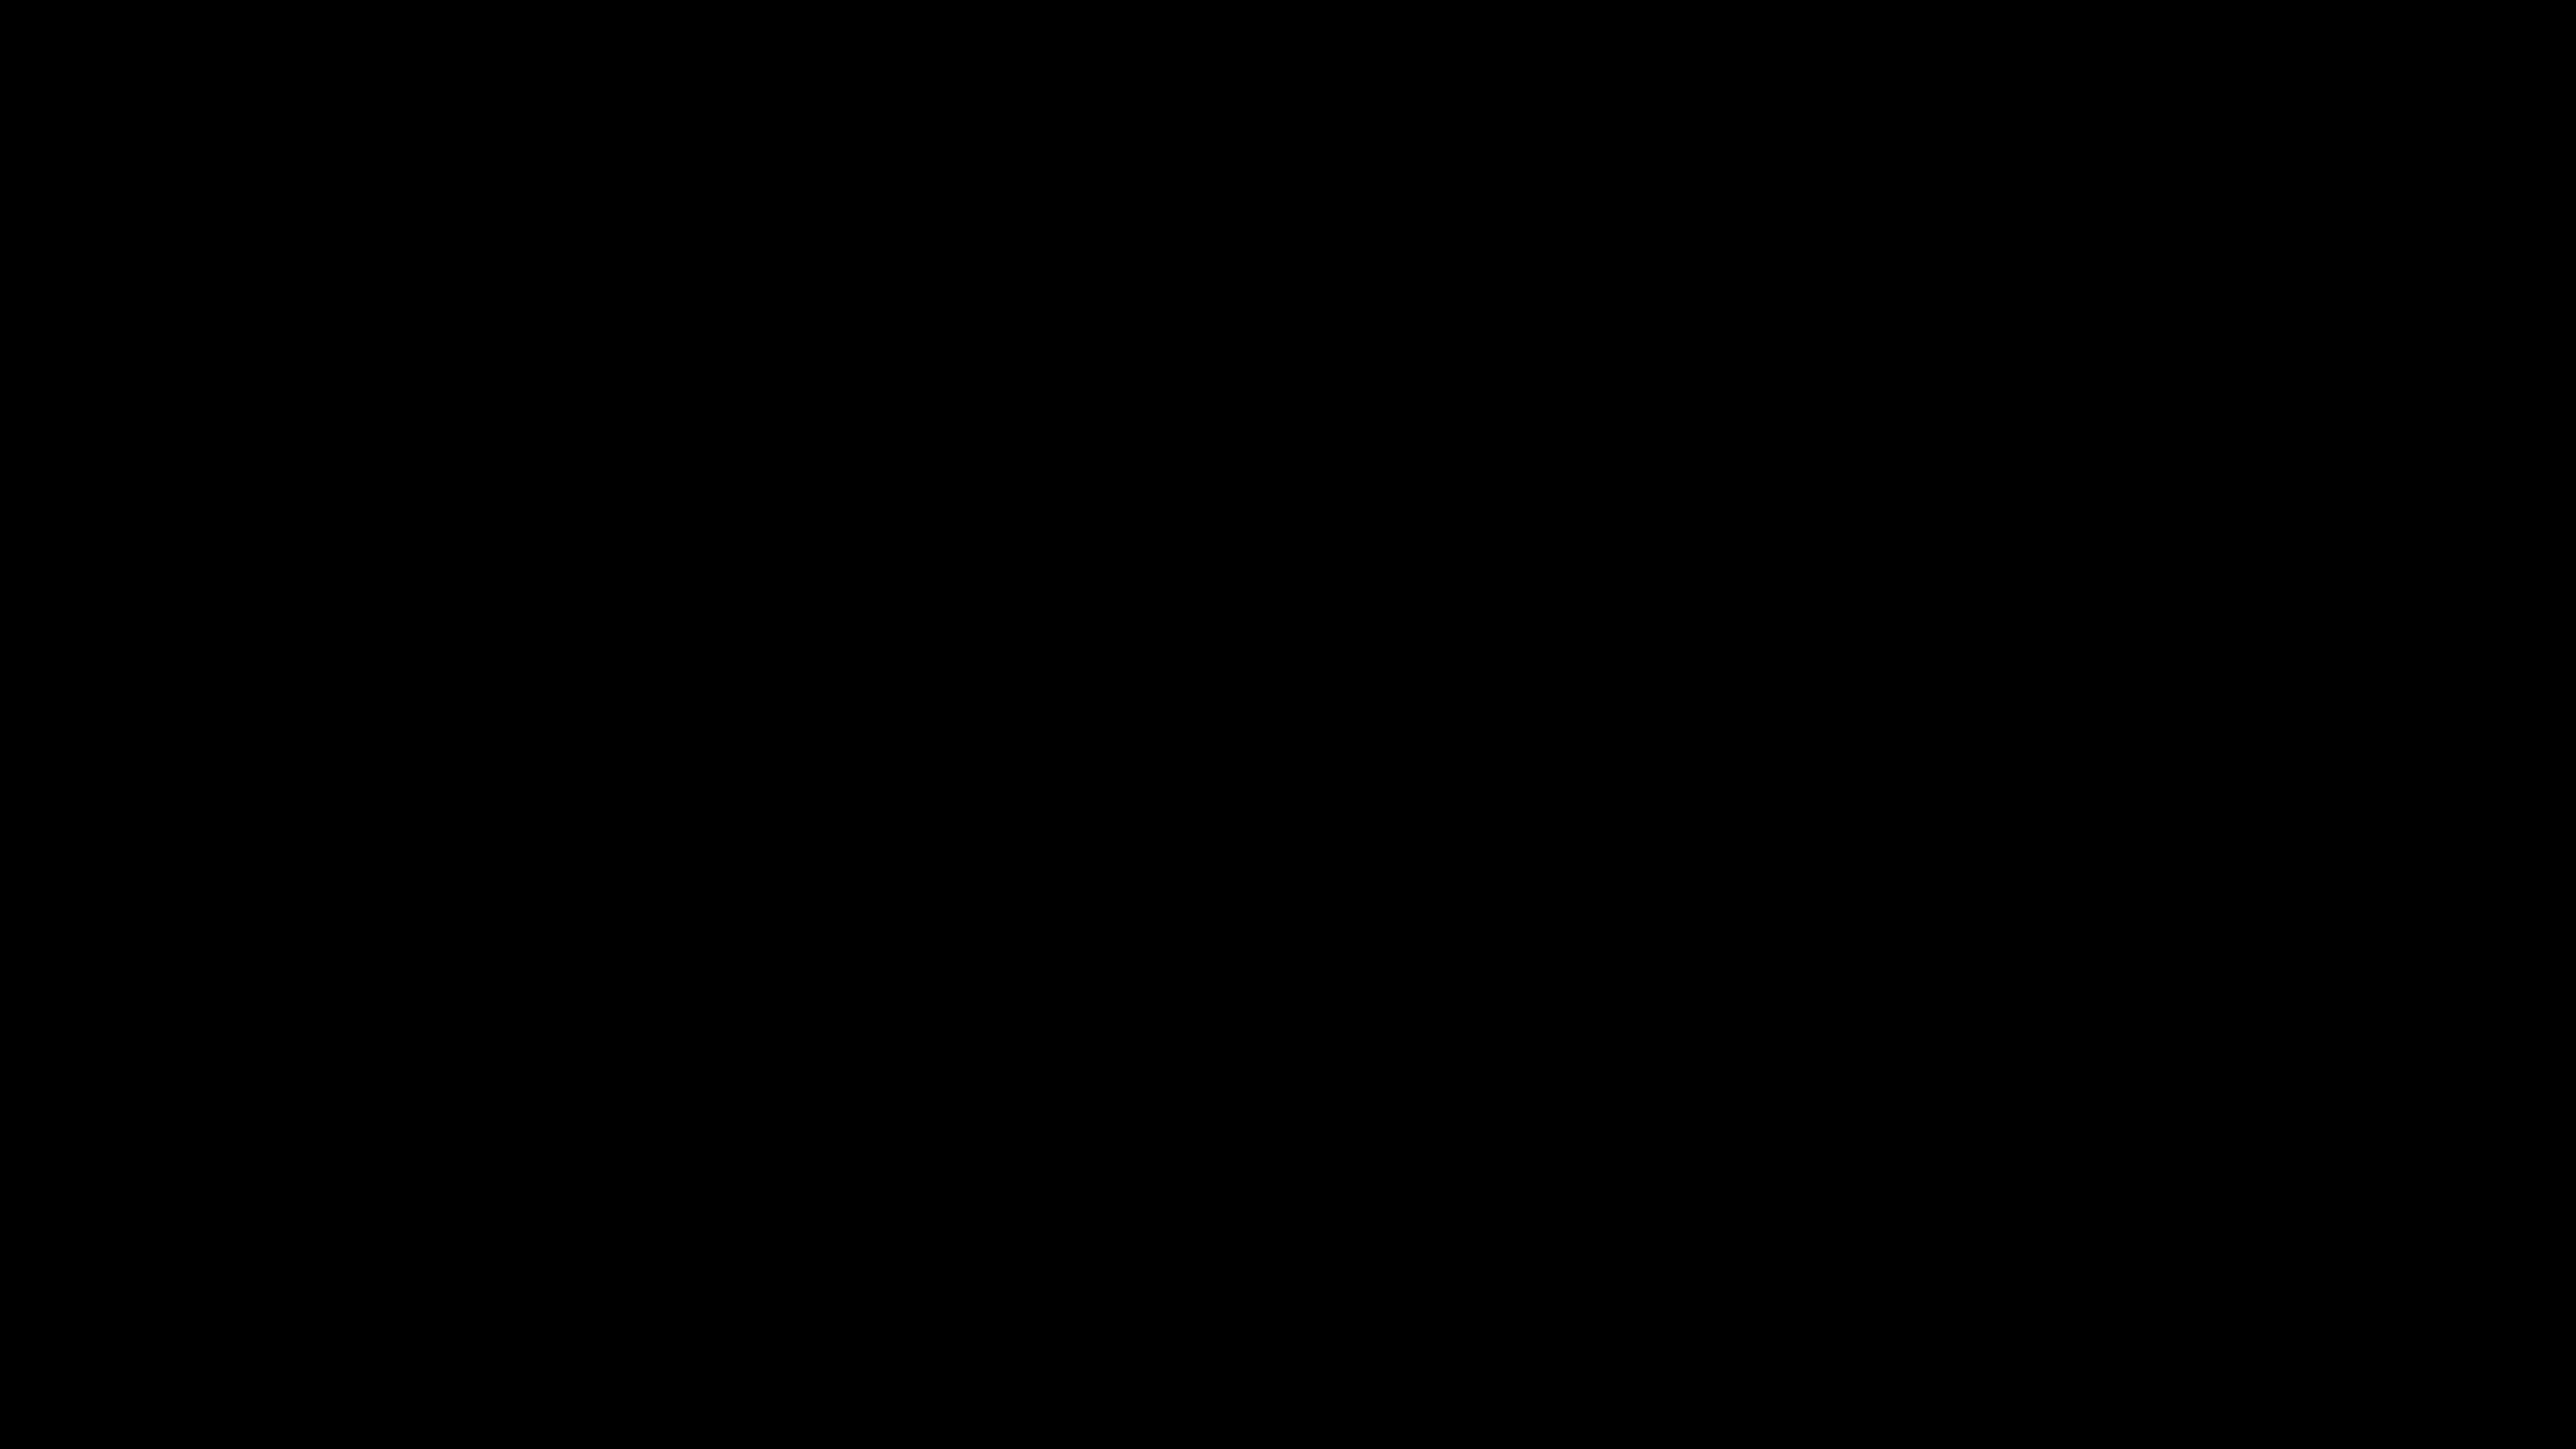 B2GO Private label GT6 Android 8,1 ТВ коробка Amlogic S905W 4 ядра 2 Гб 16 телевизионная коробка